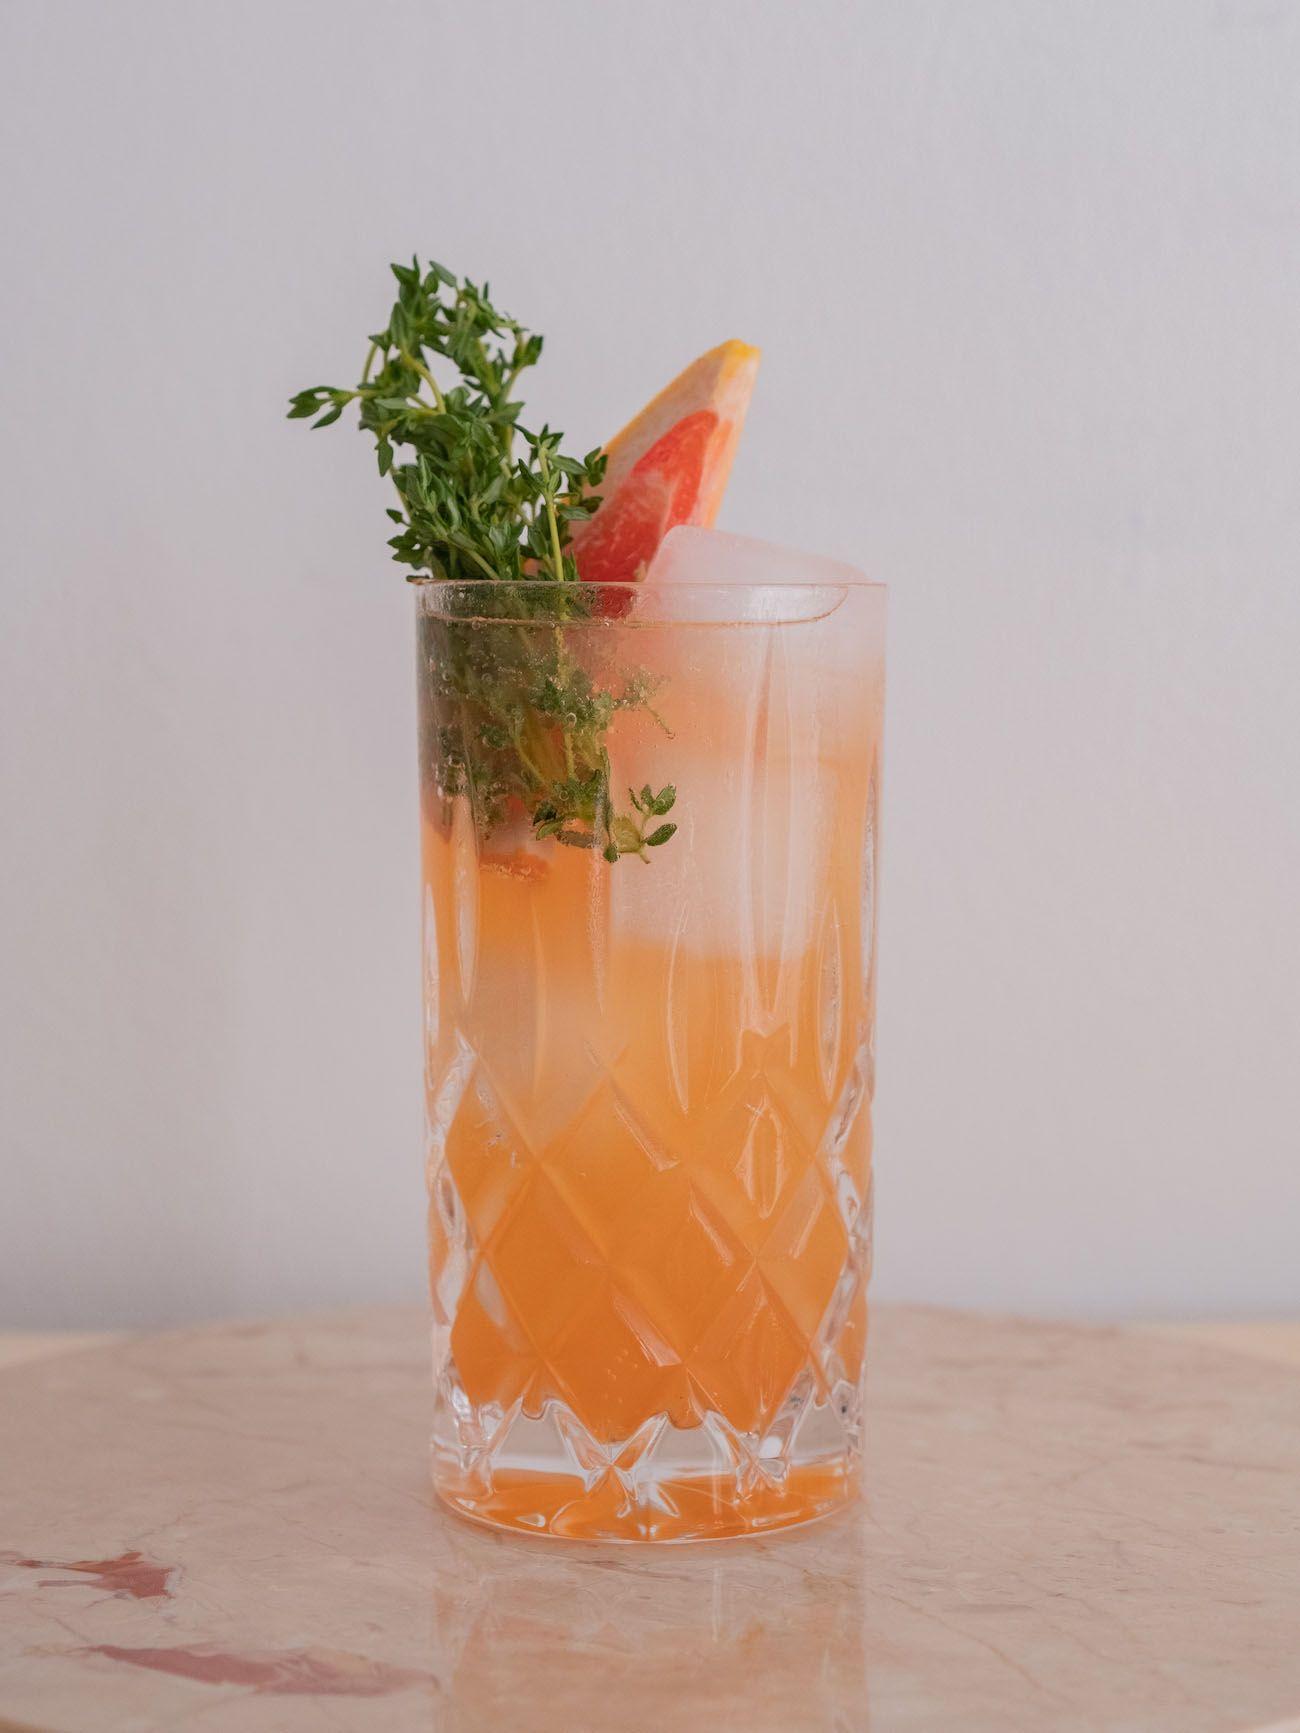 Foodblog, About Fuel, Soda Stream, Sirup, Rezept, Pink Grapefruit mit Thymian, Glas